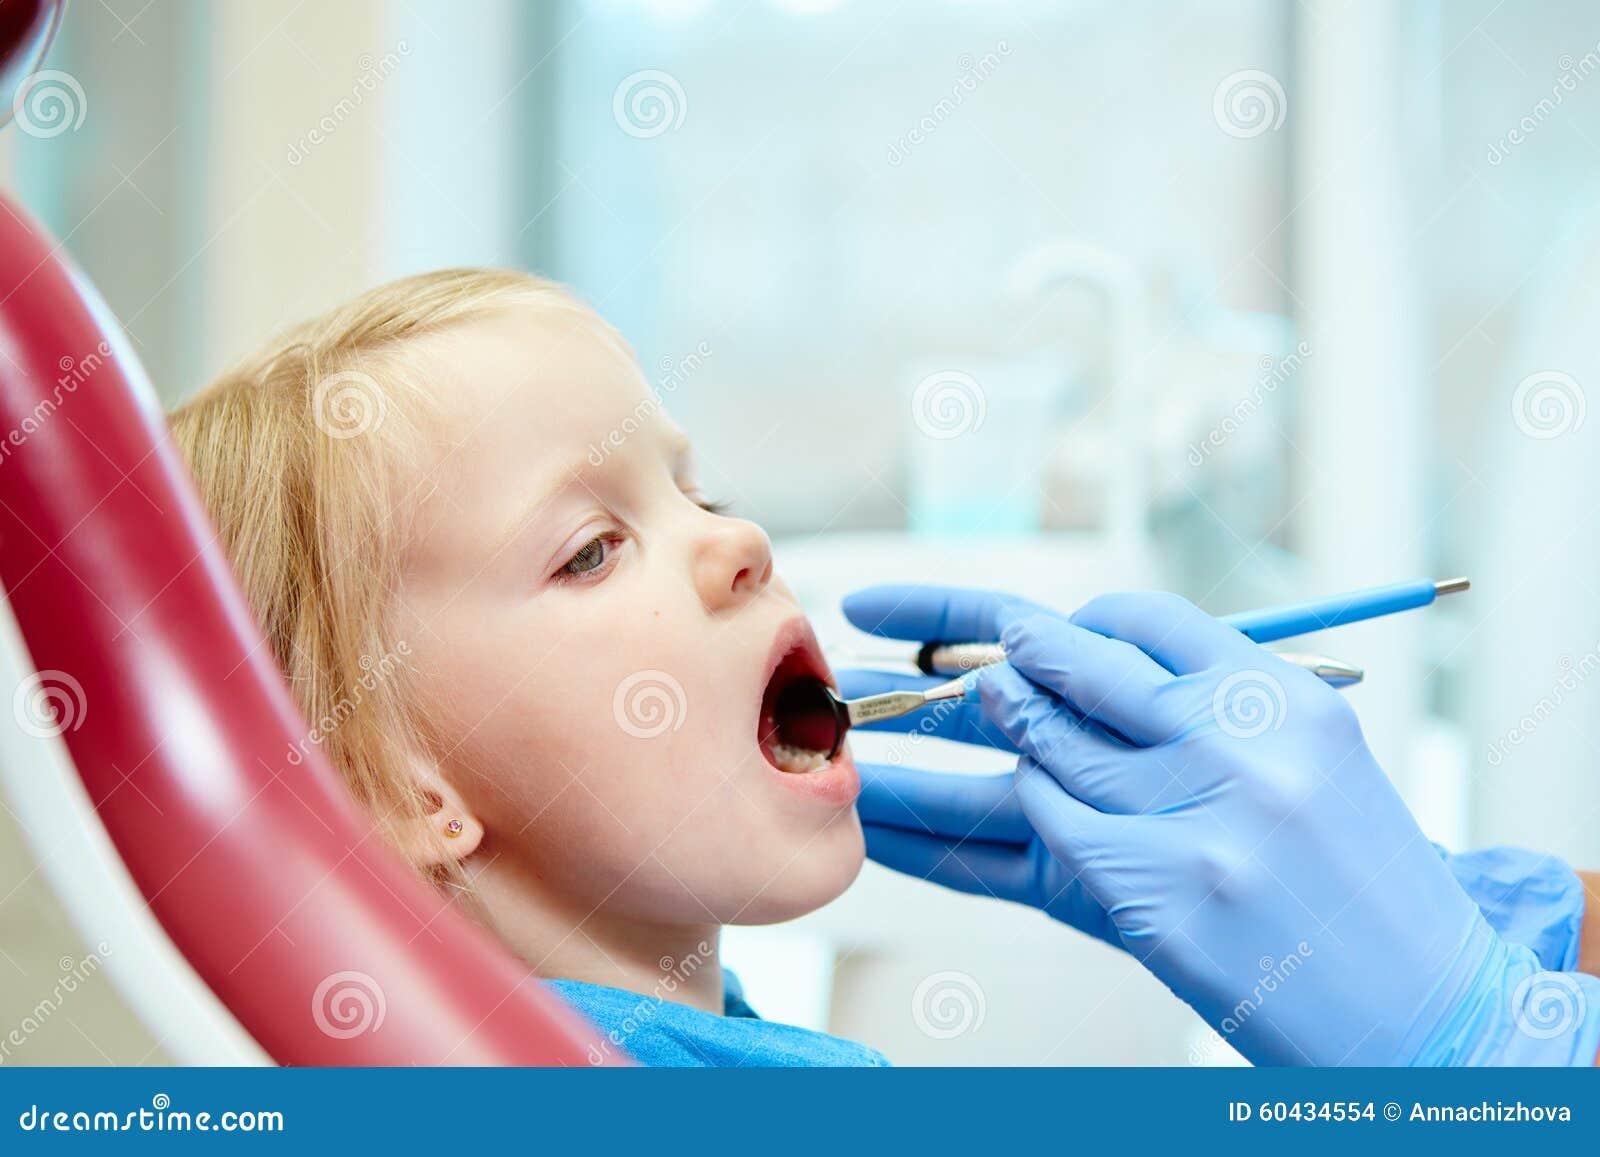 Pediatric dentist examining little girls teeth in